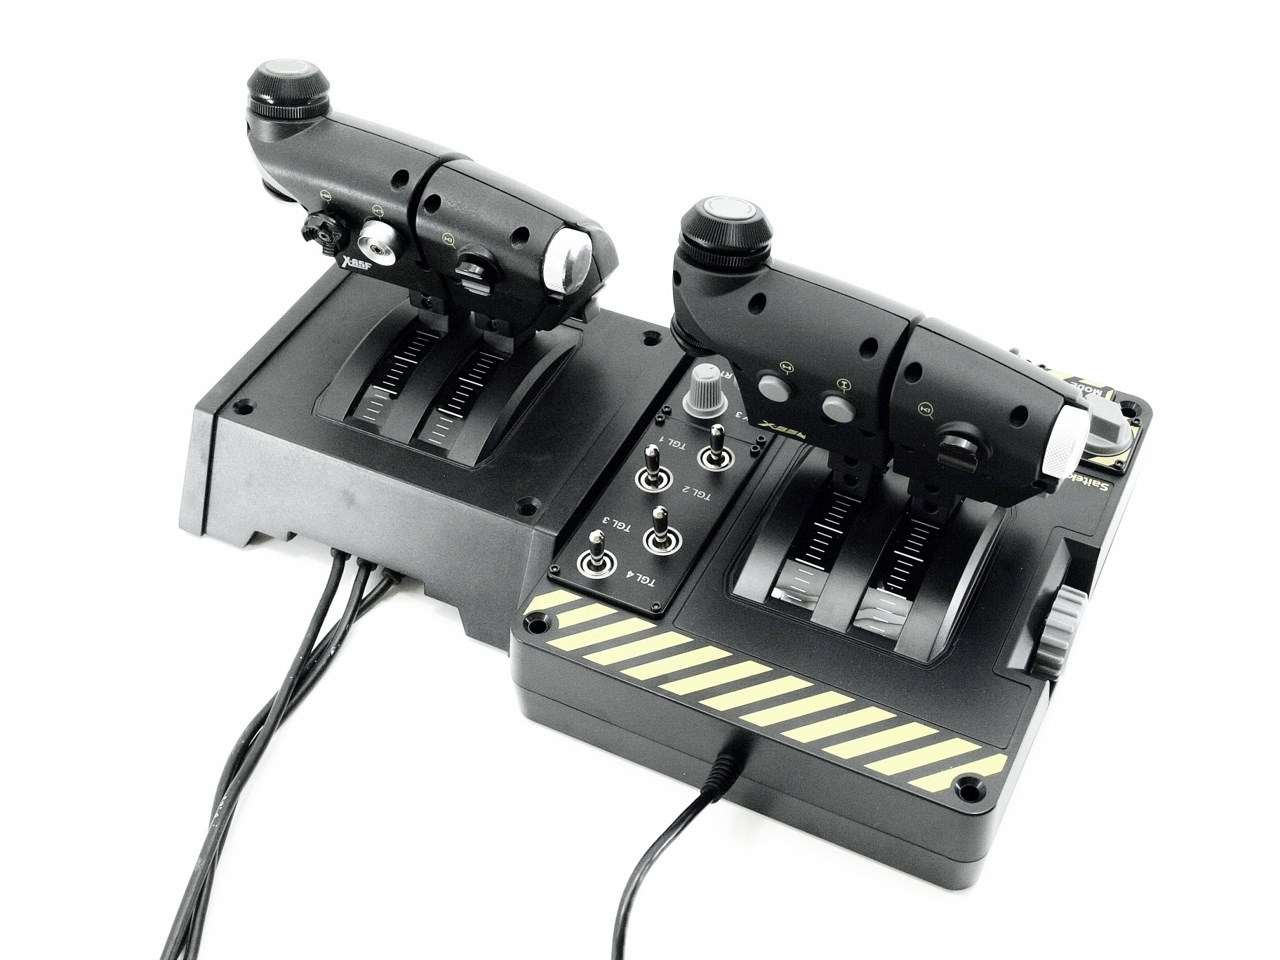 Saitek X-55 Rhino HOTAS System Review